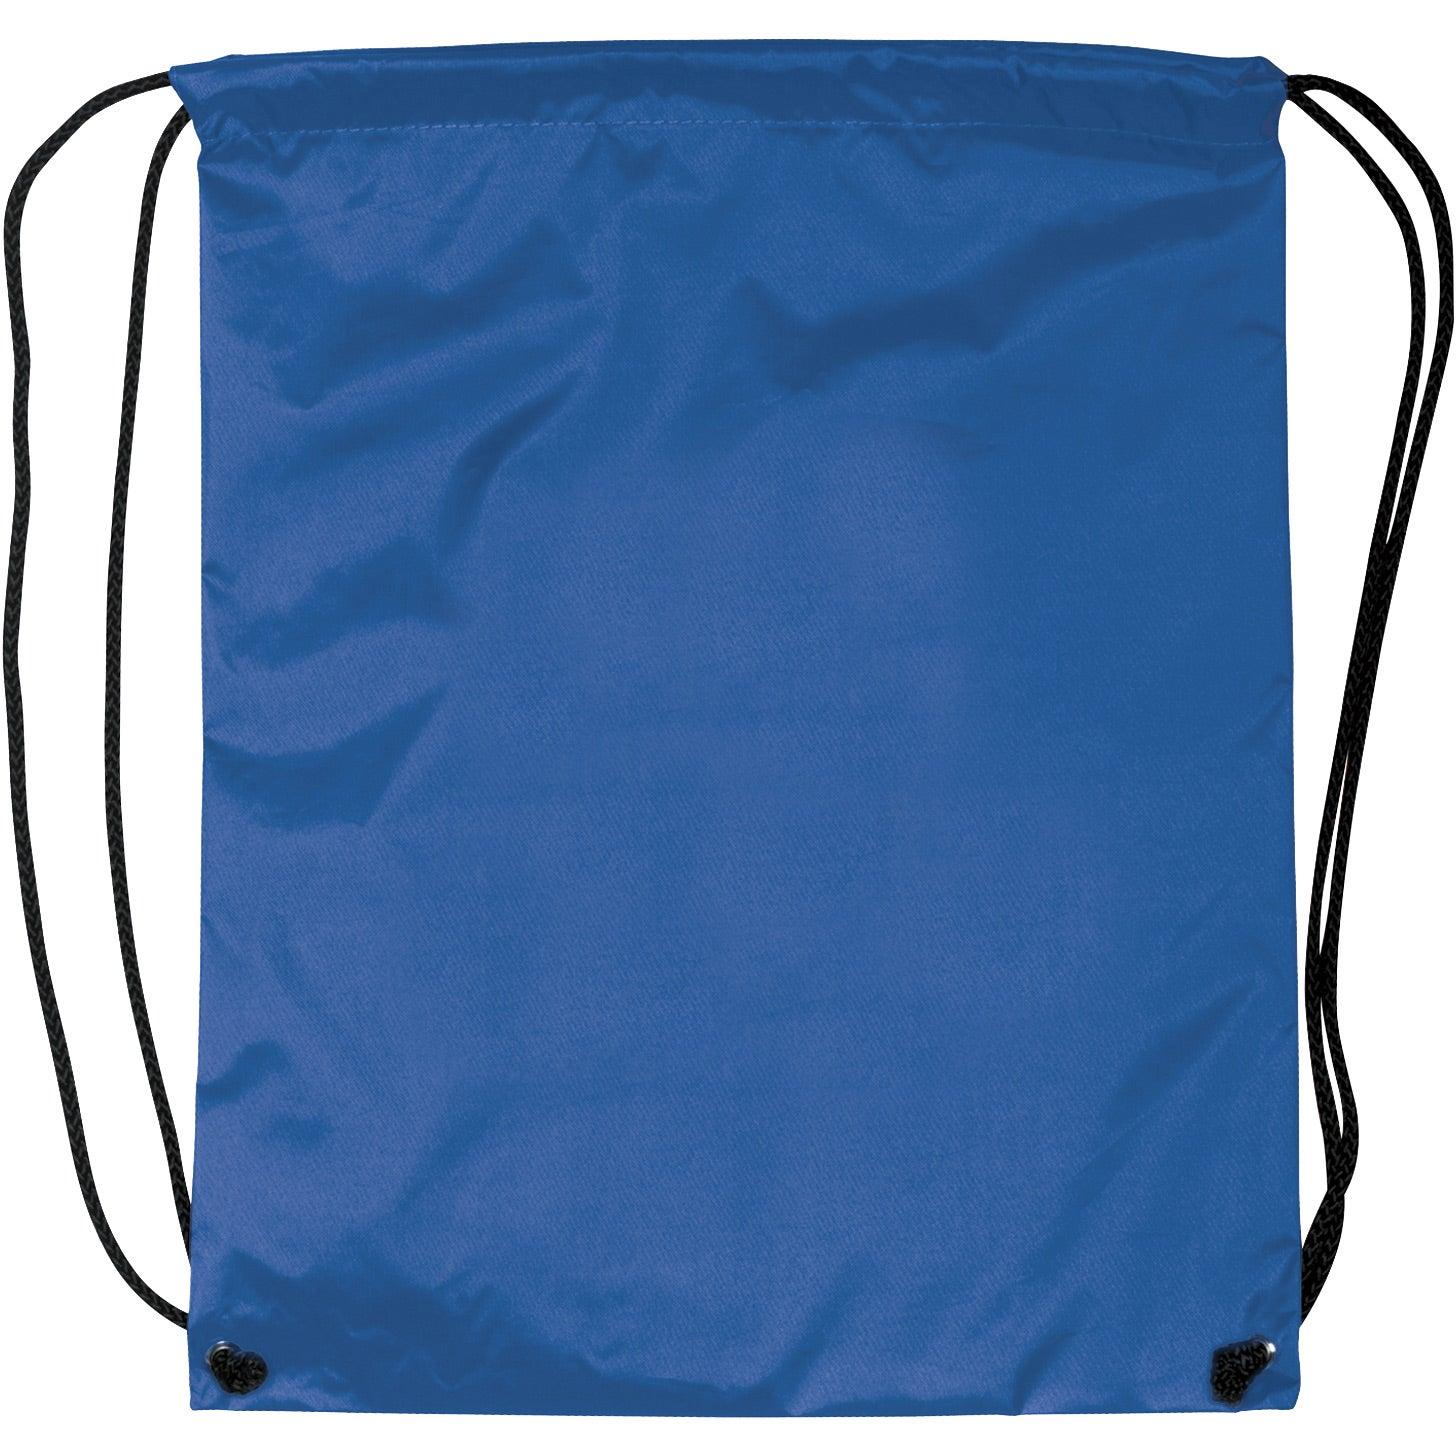 Your Nylon Backsack On 13